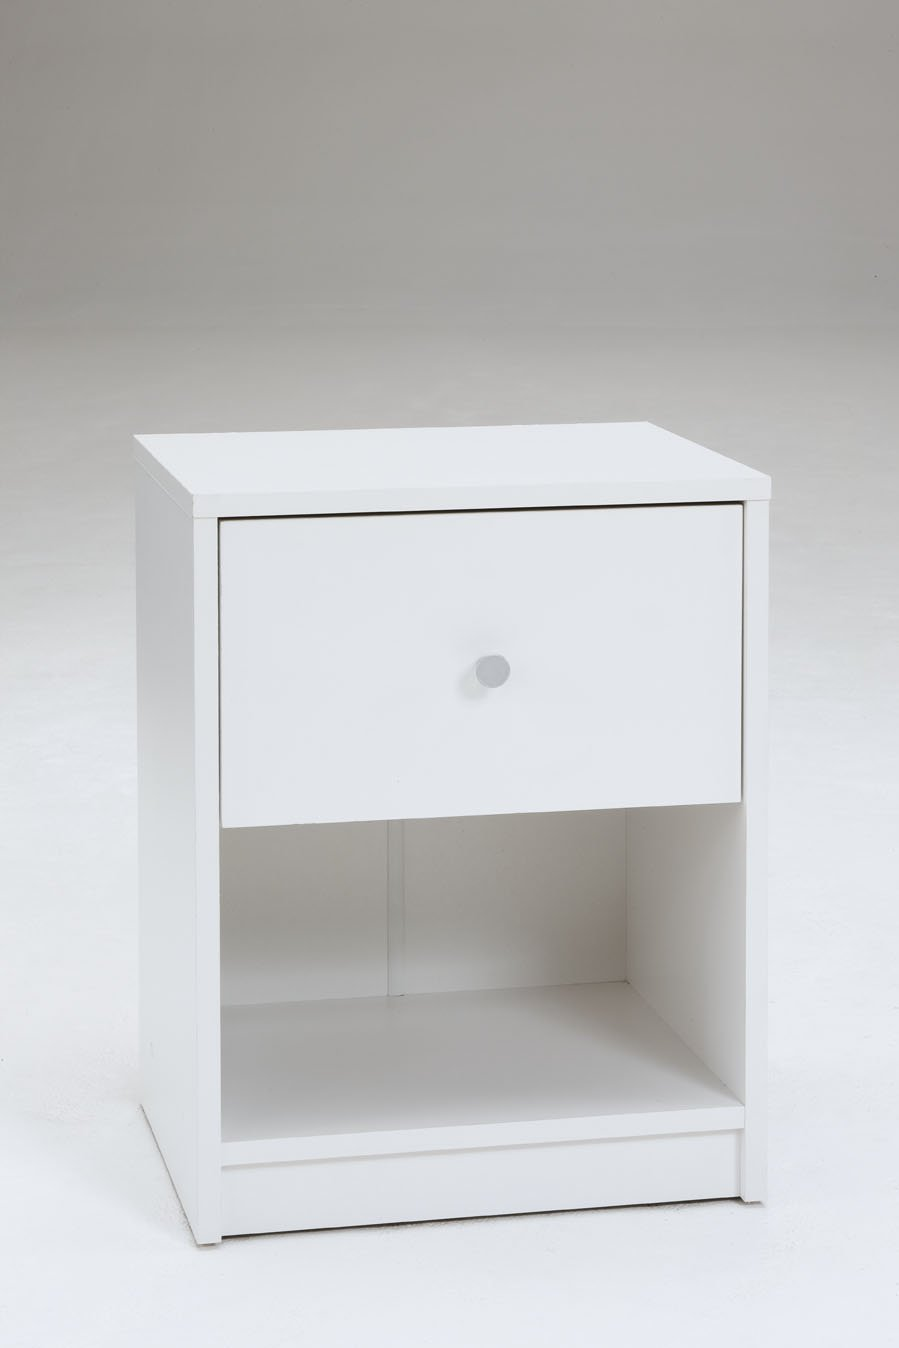 Tvilum 7033149 Portland 1 Drawer Nightstand, White by Tvilum